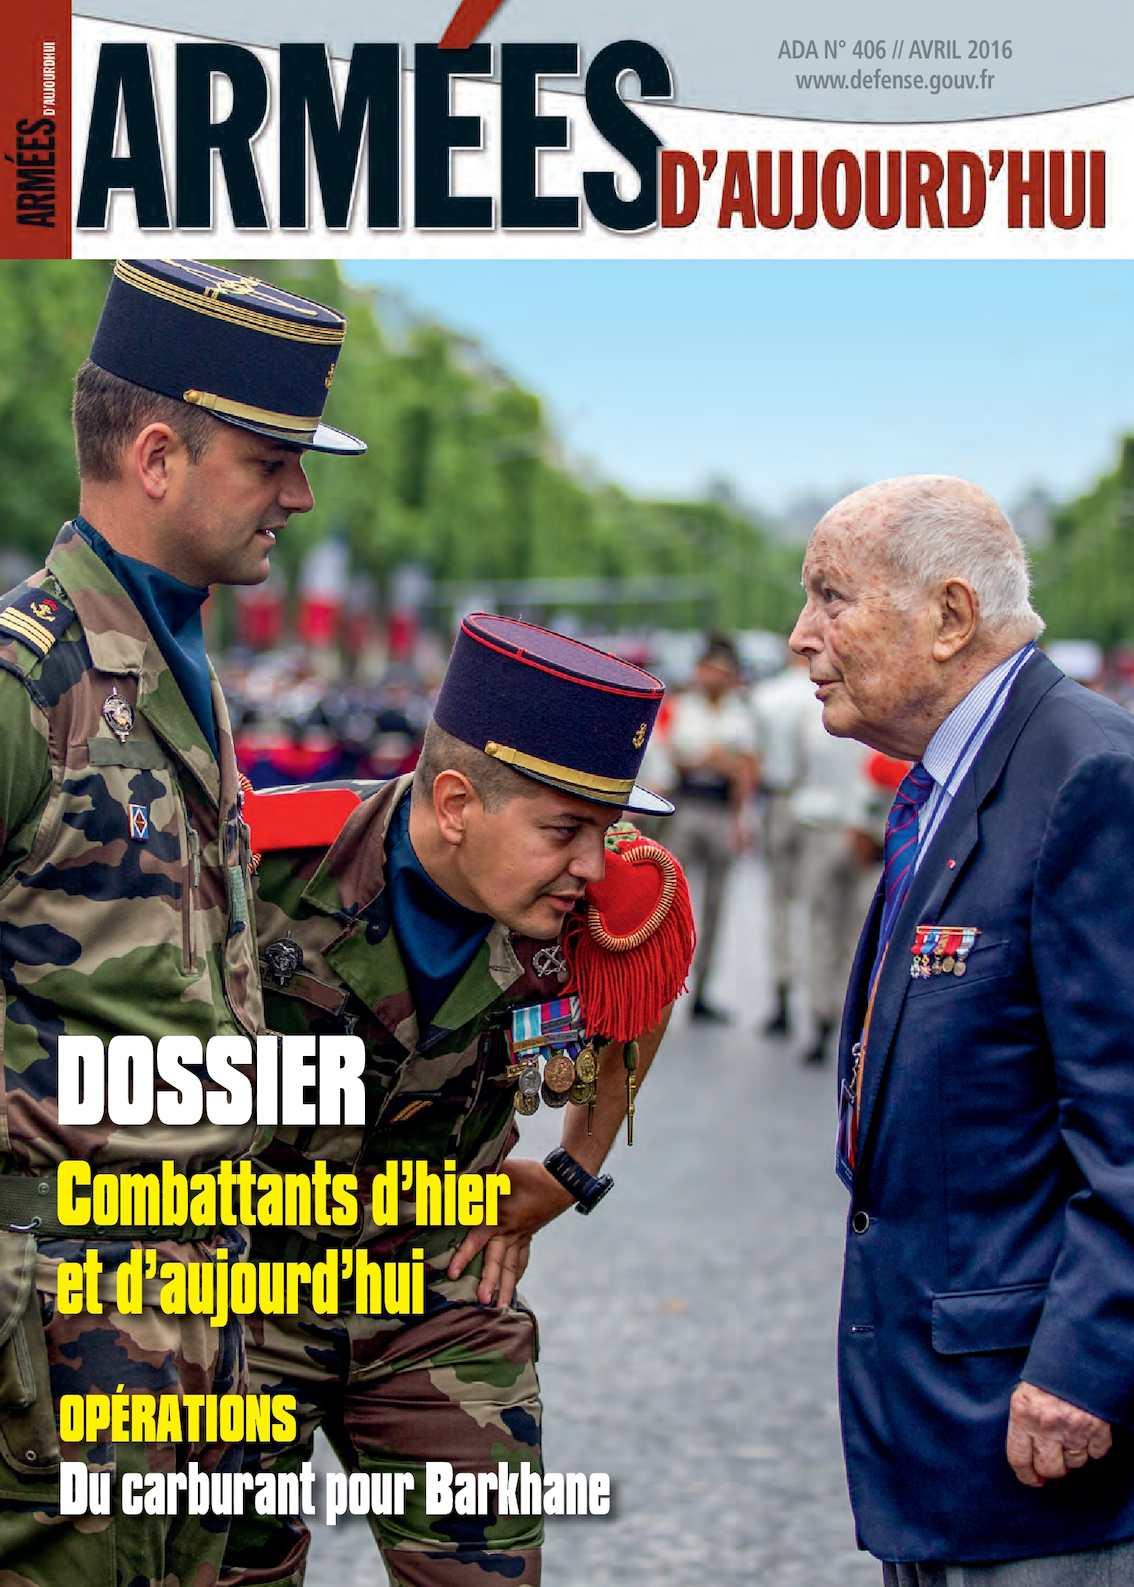 Armées d'Aujourd'hui n° 406 Avril 2016